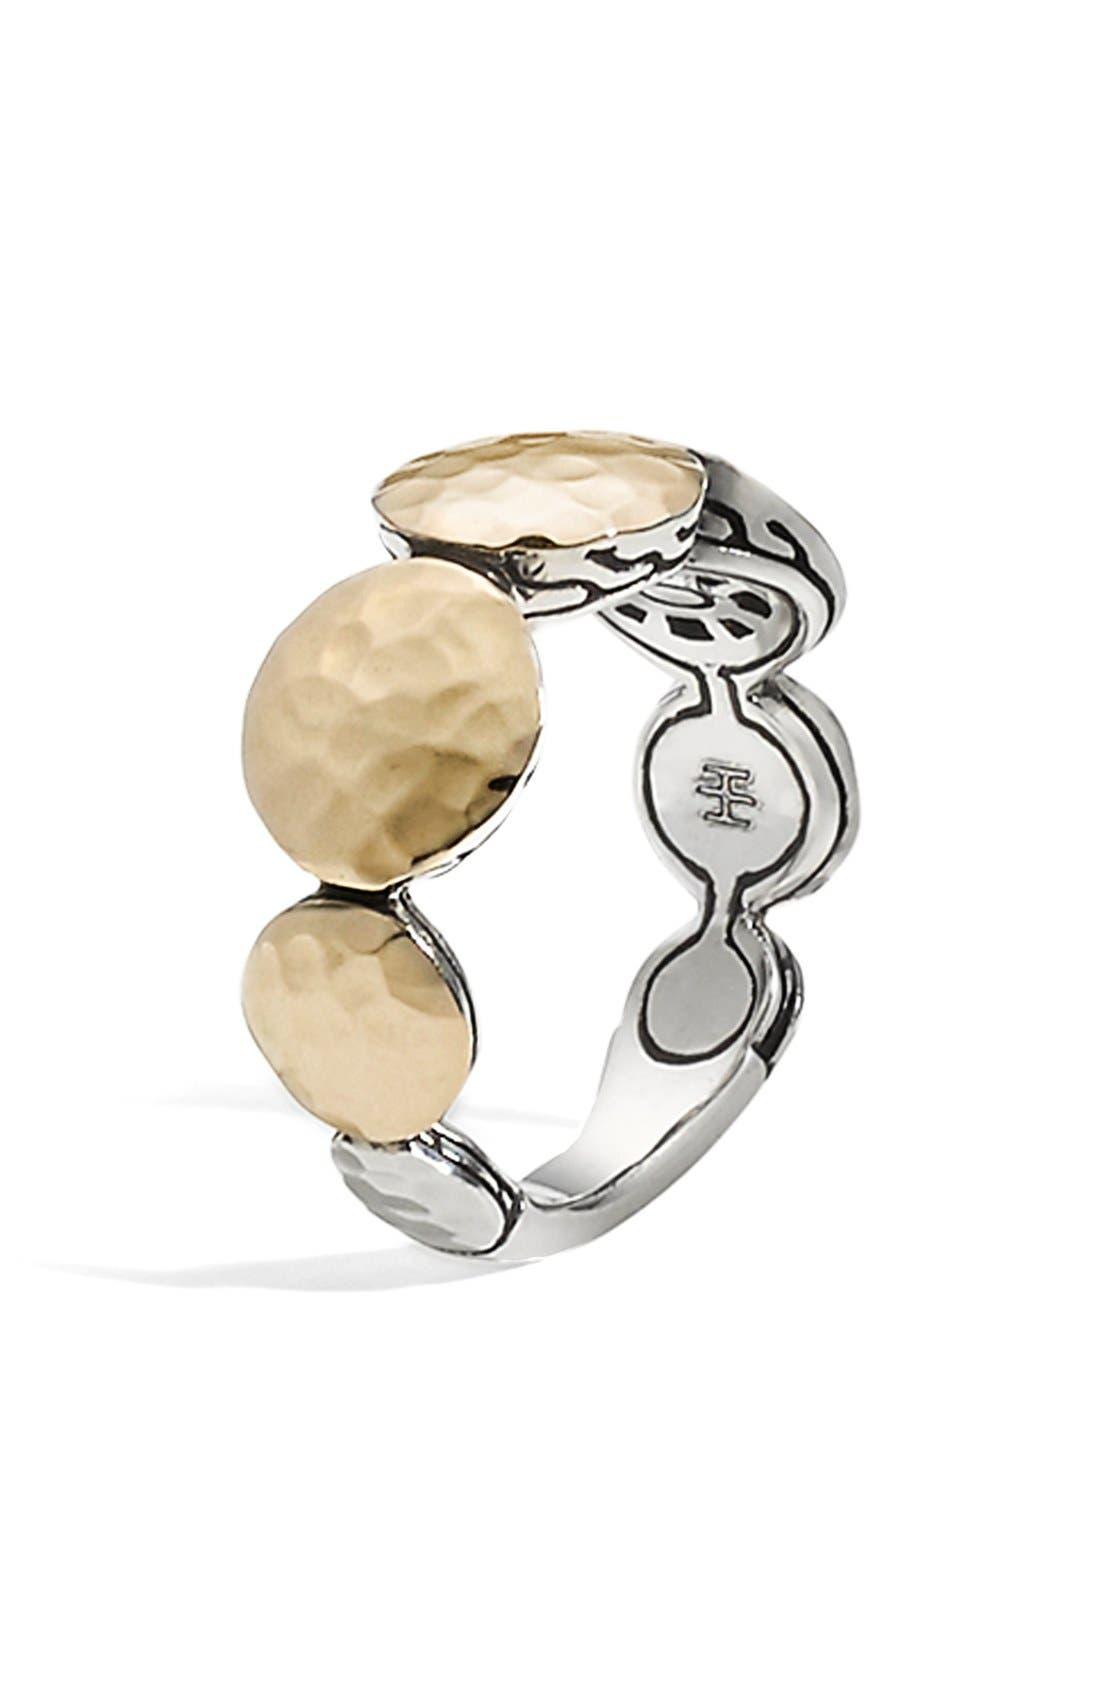 Alternate Image 1 Selected - John Hardy 'Dot' Tapered Ring